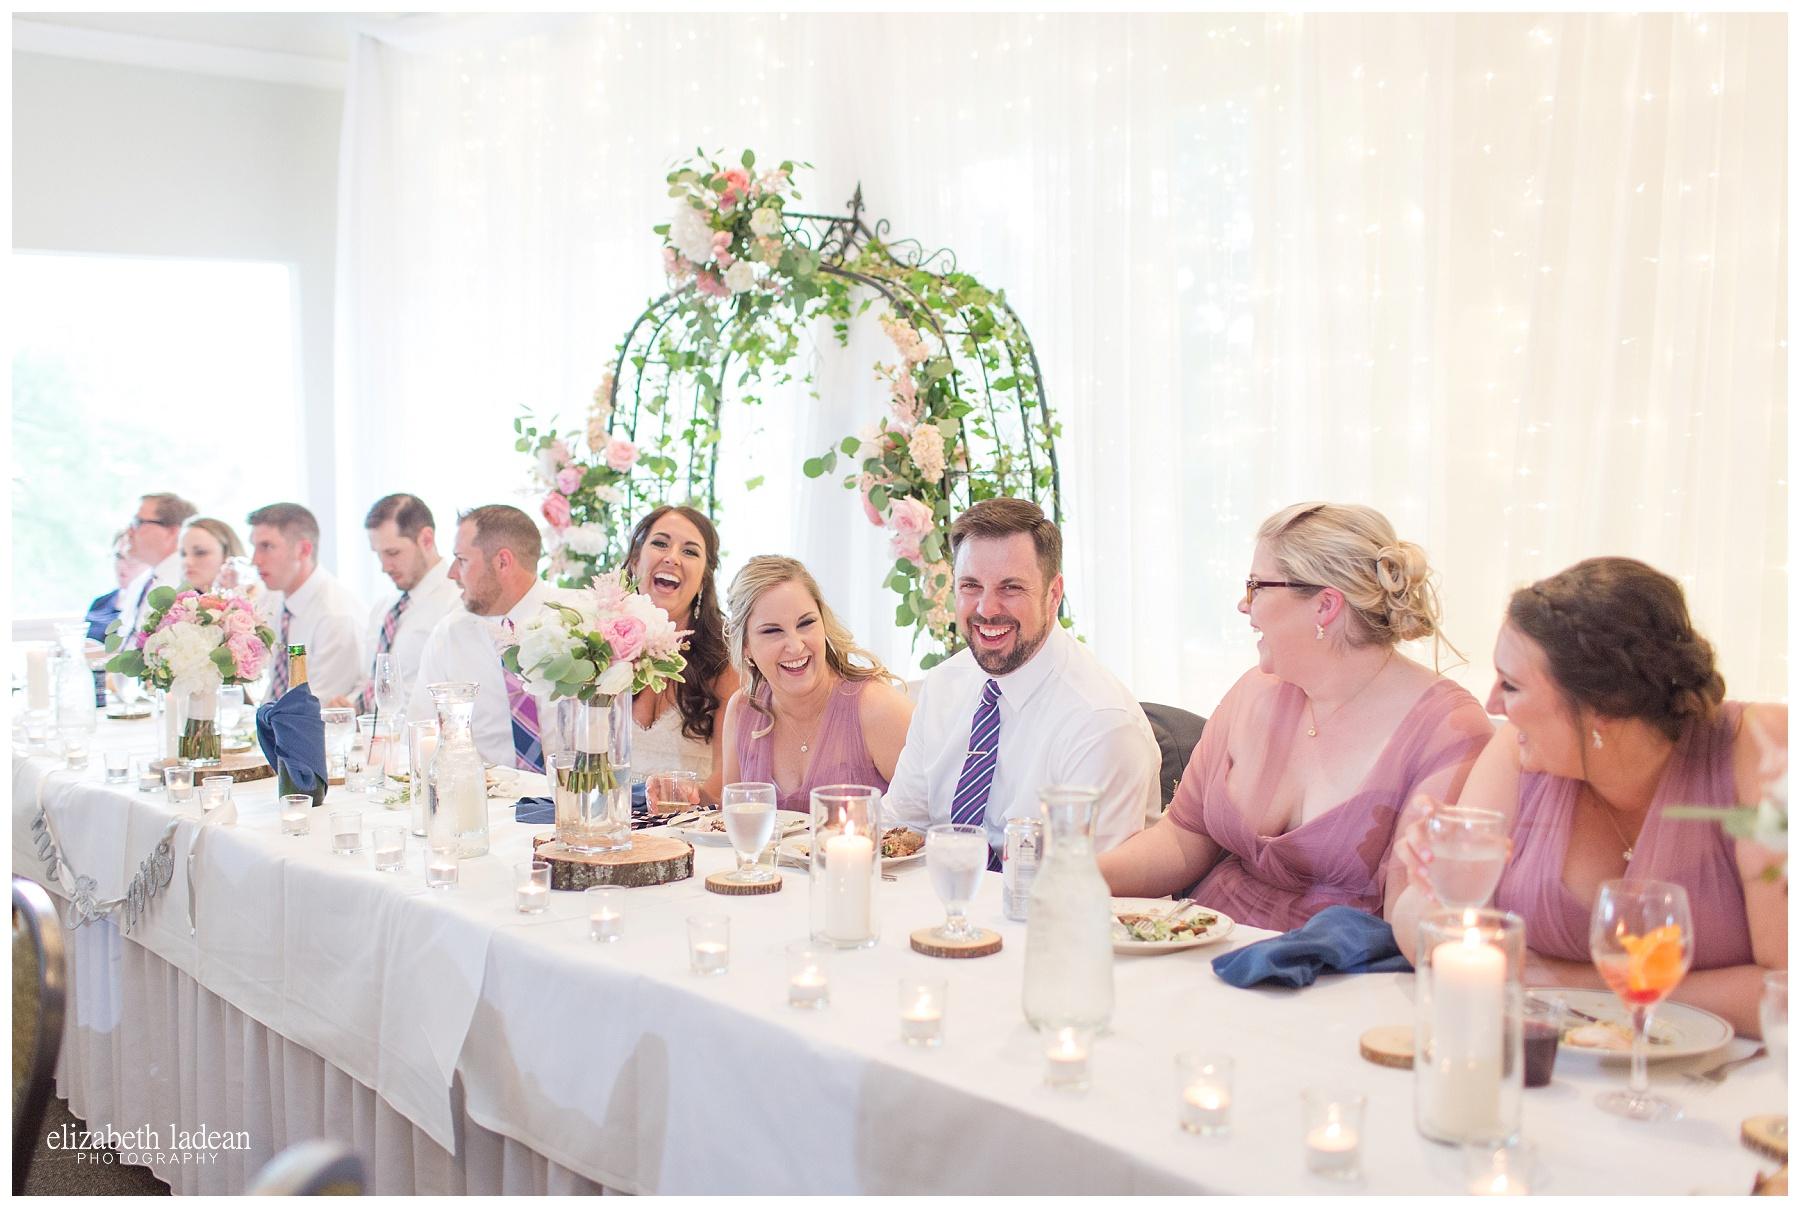 Hillcrest-Country-Club-Kansas-City-Wedding-Photography-E+J-0520-Elizabeth-Ladean-Photography-photo_0858.jpg